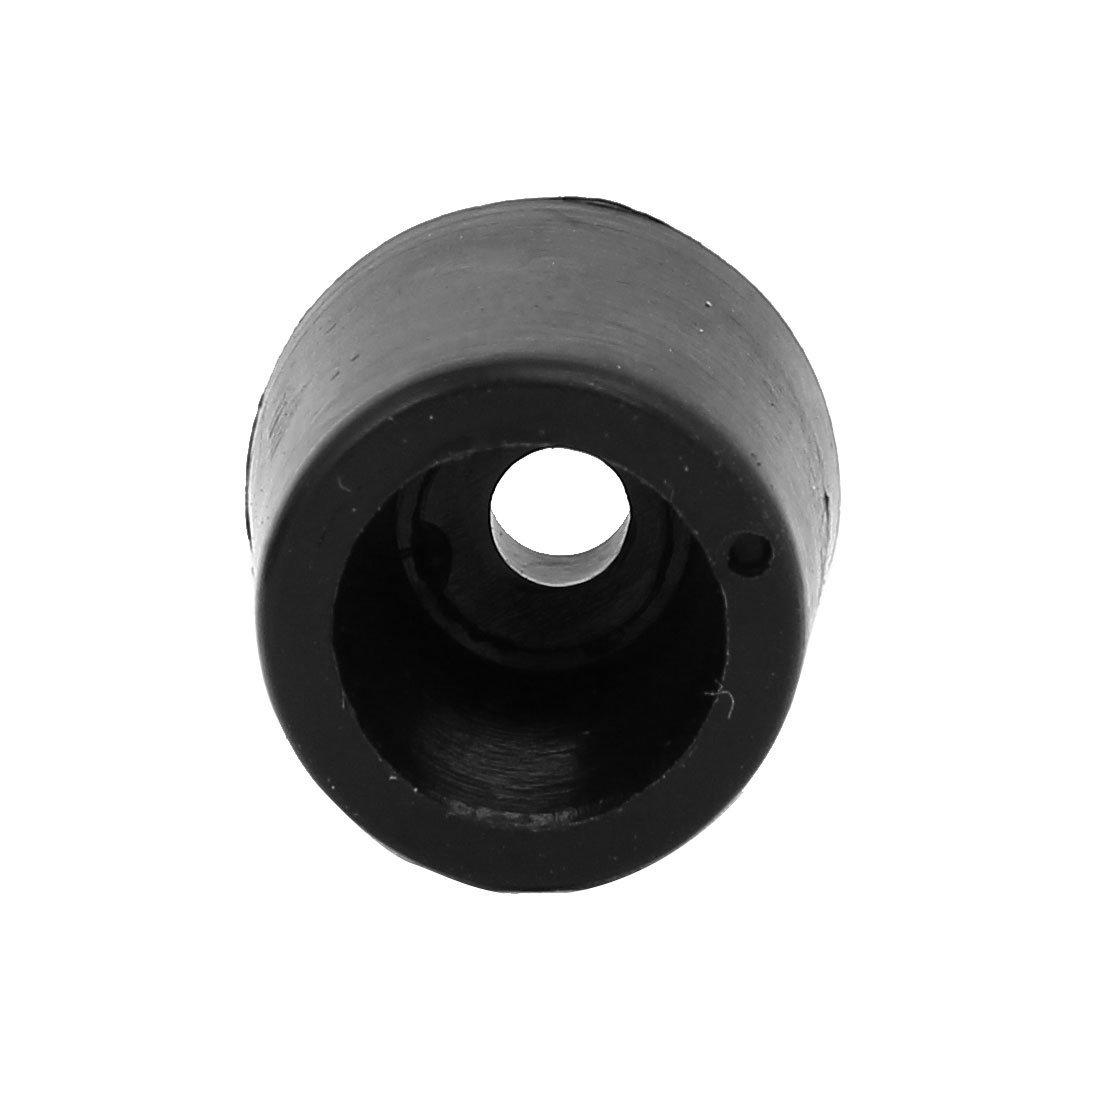 EbuyChX 17mmx15mm Goma Alimusod Non-Slip Cover Tip Muwebles Floor Pad Black 200pcs